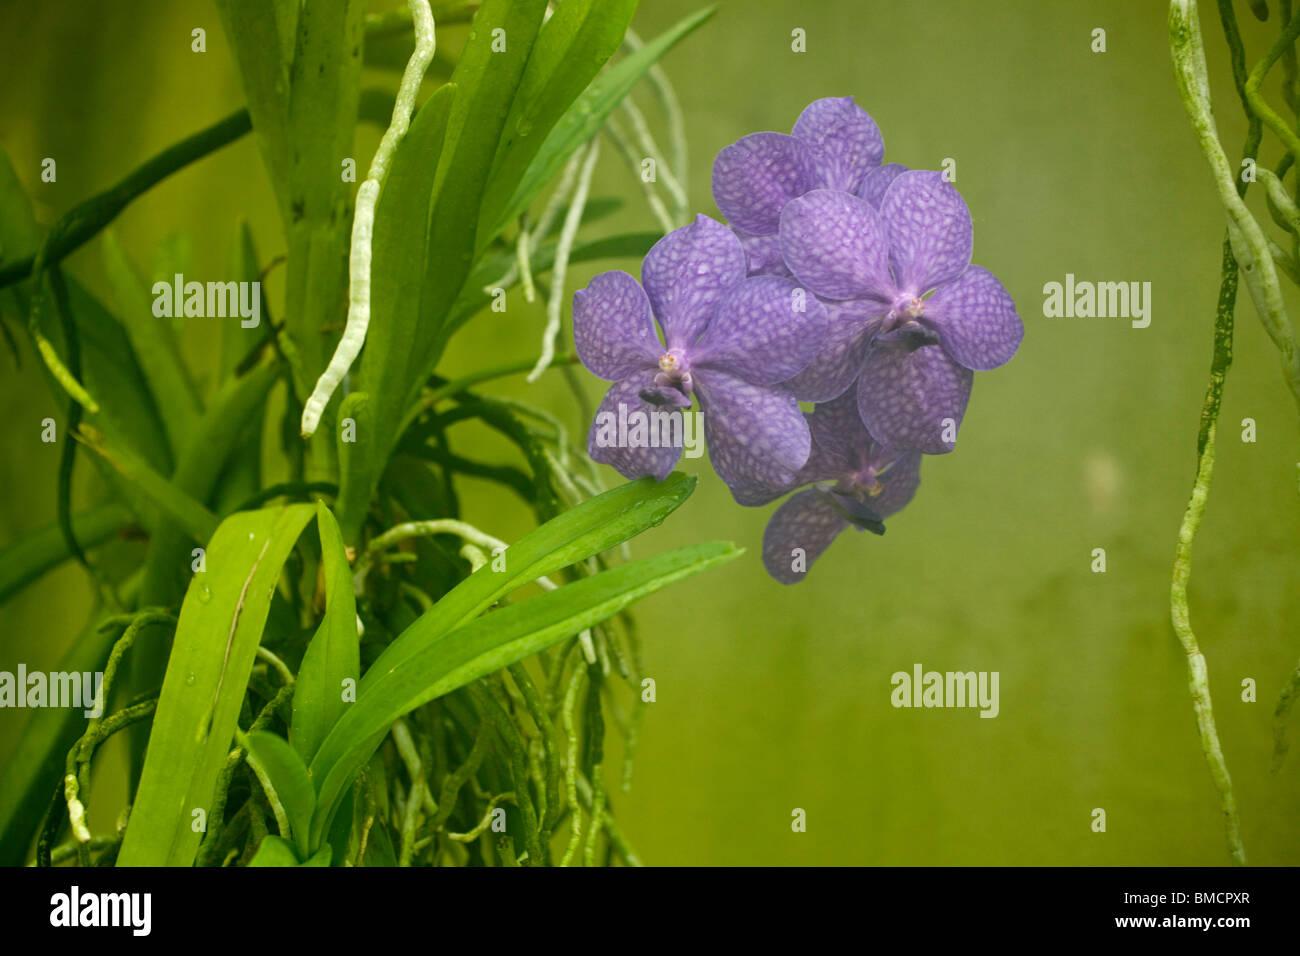 Vanda, Manivadee 'Sky', orchid family - Stock Image